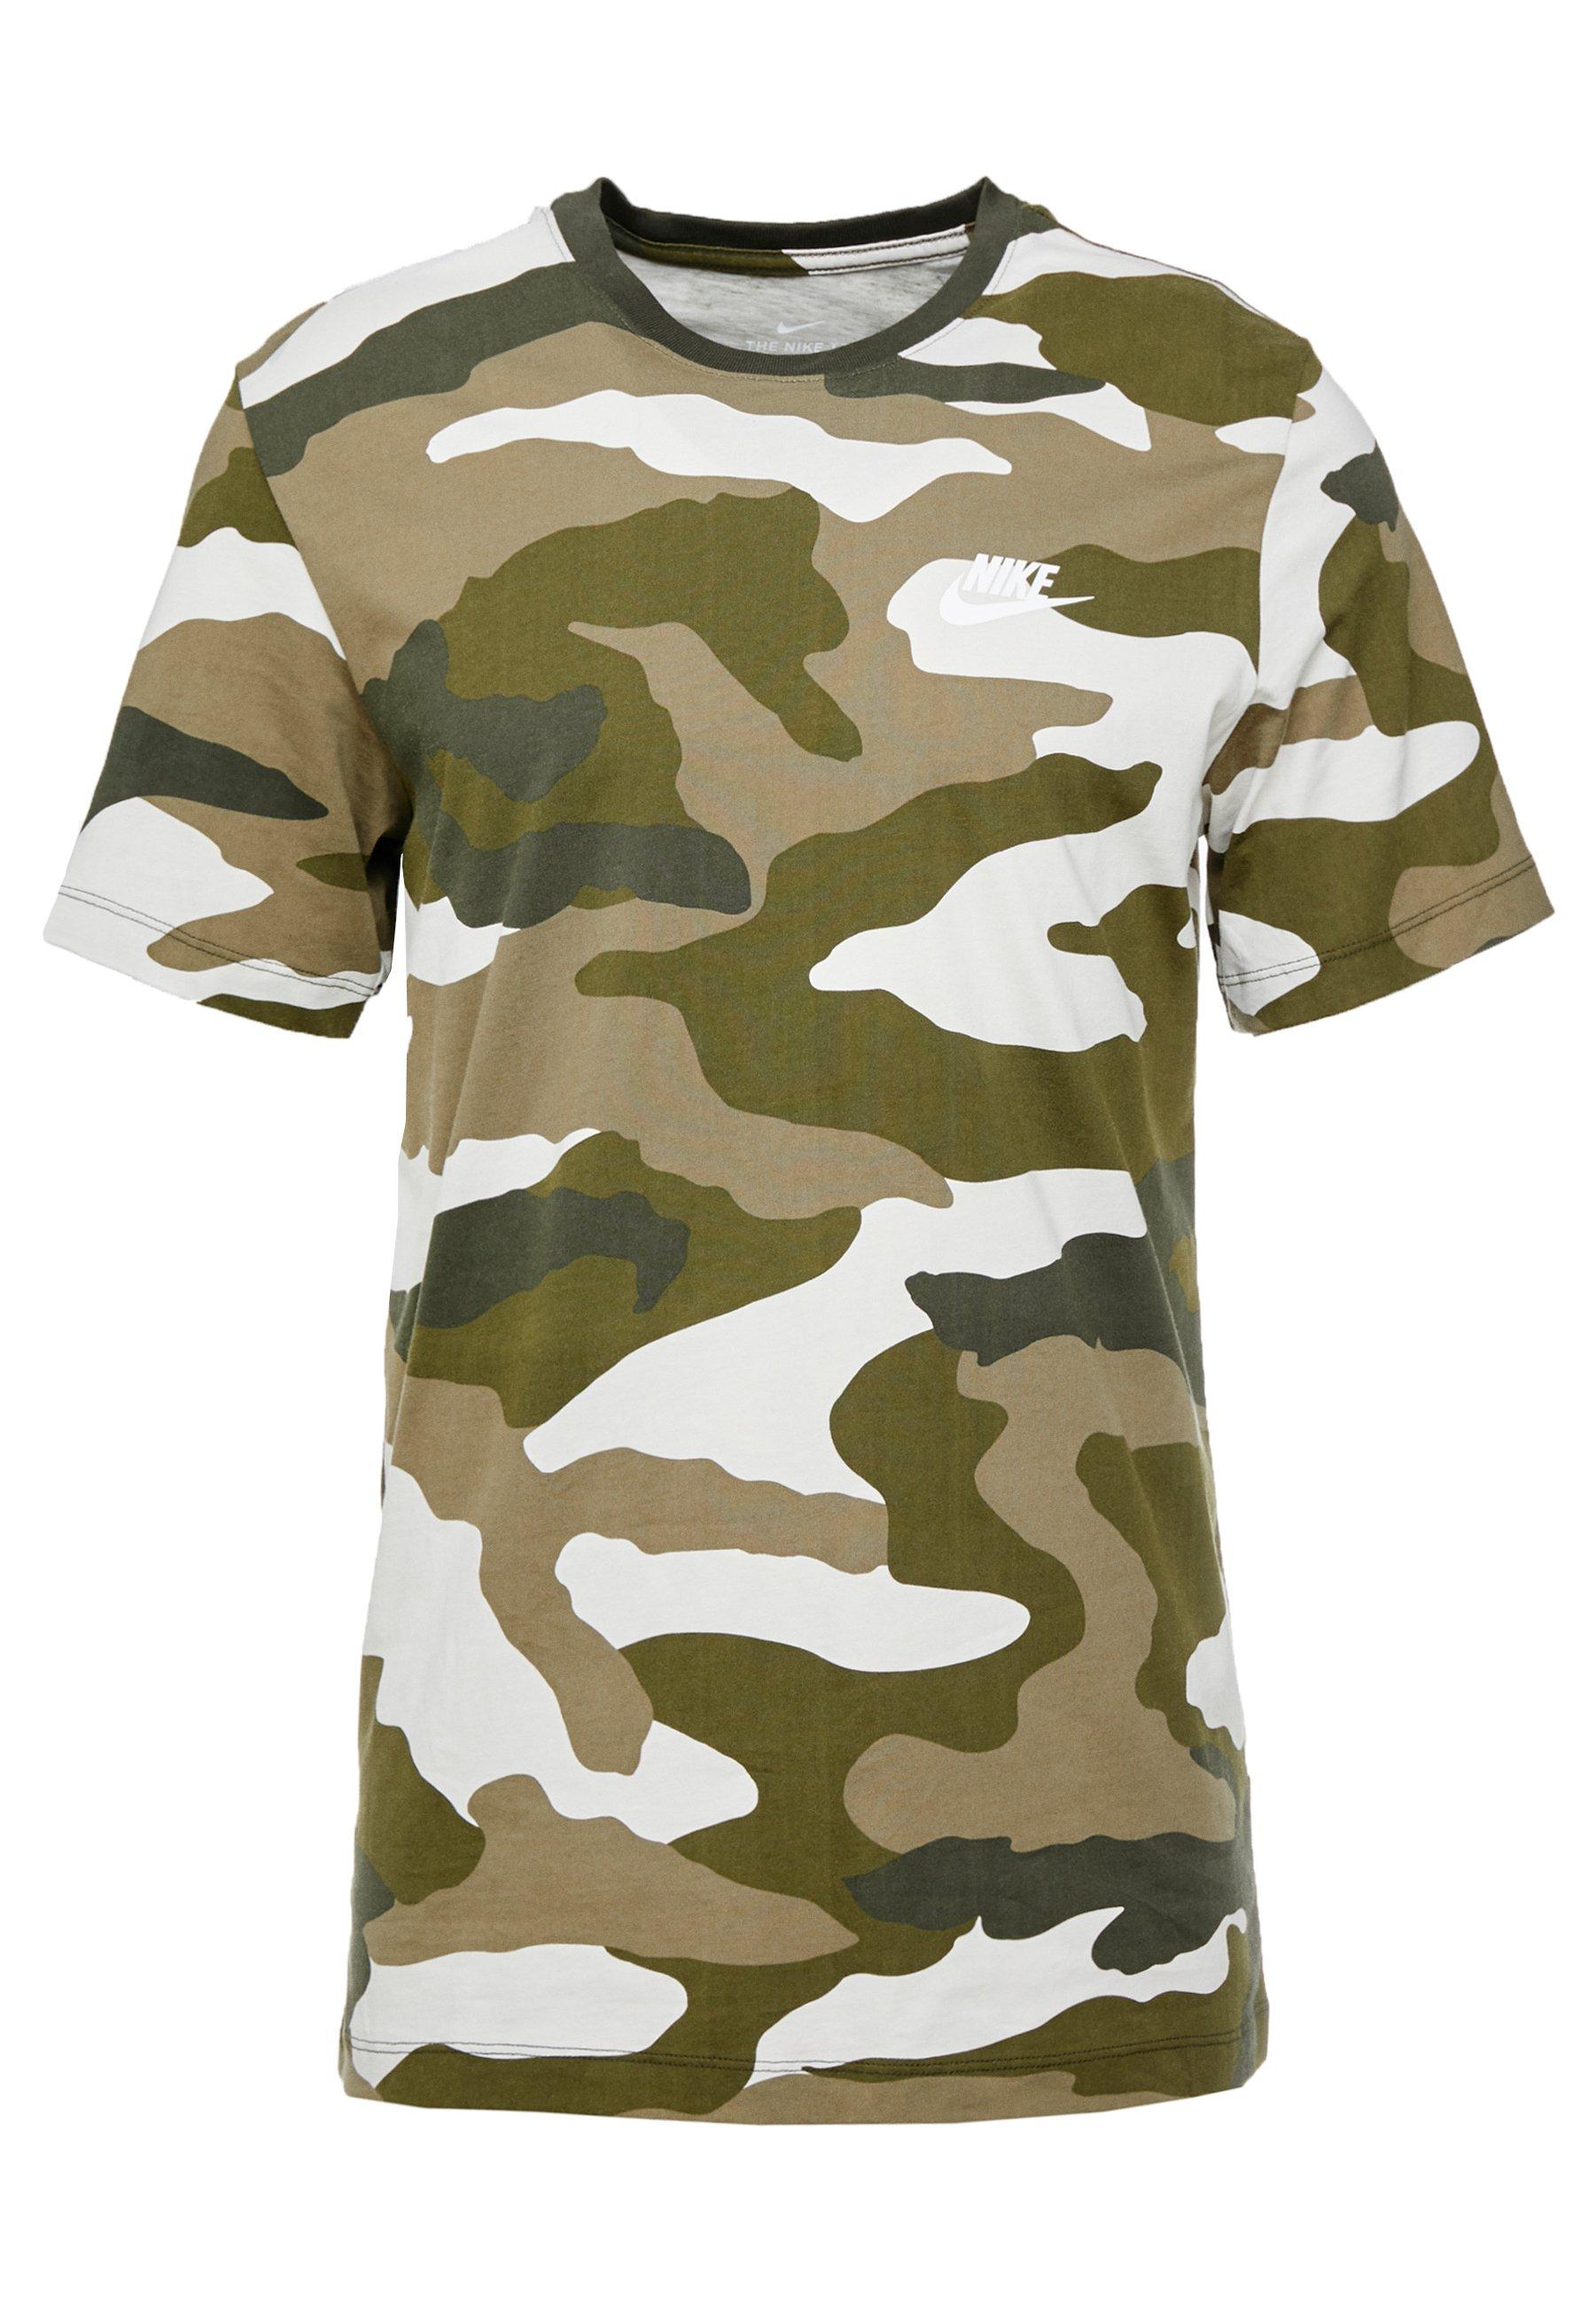 TEE T shirt imprimé light bonemedium olivelegion green